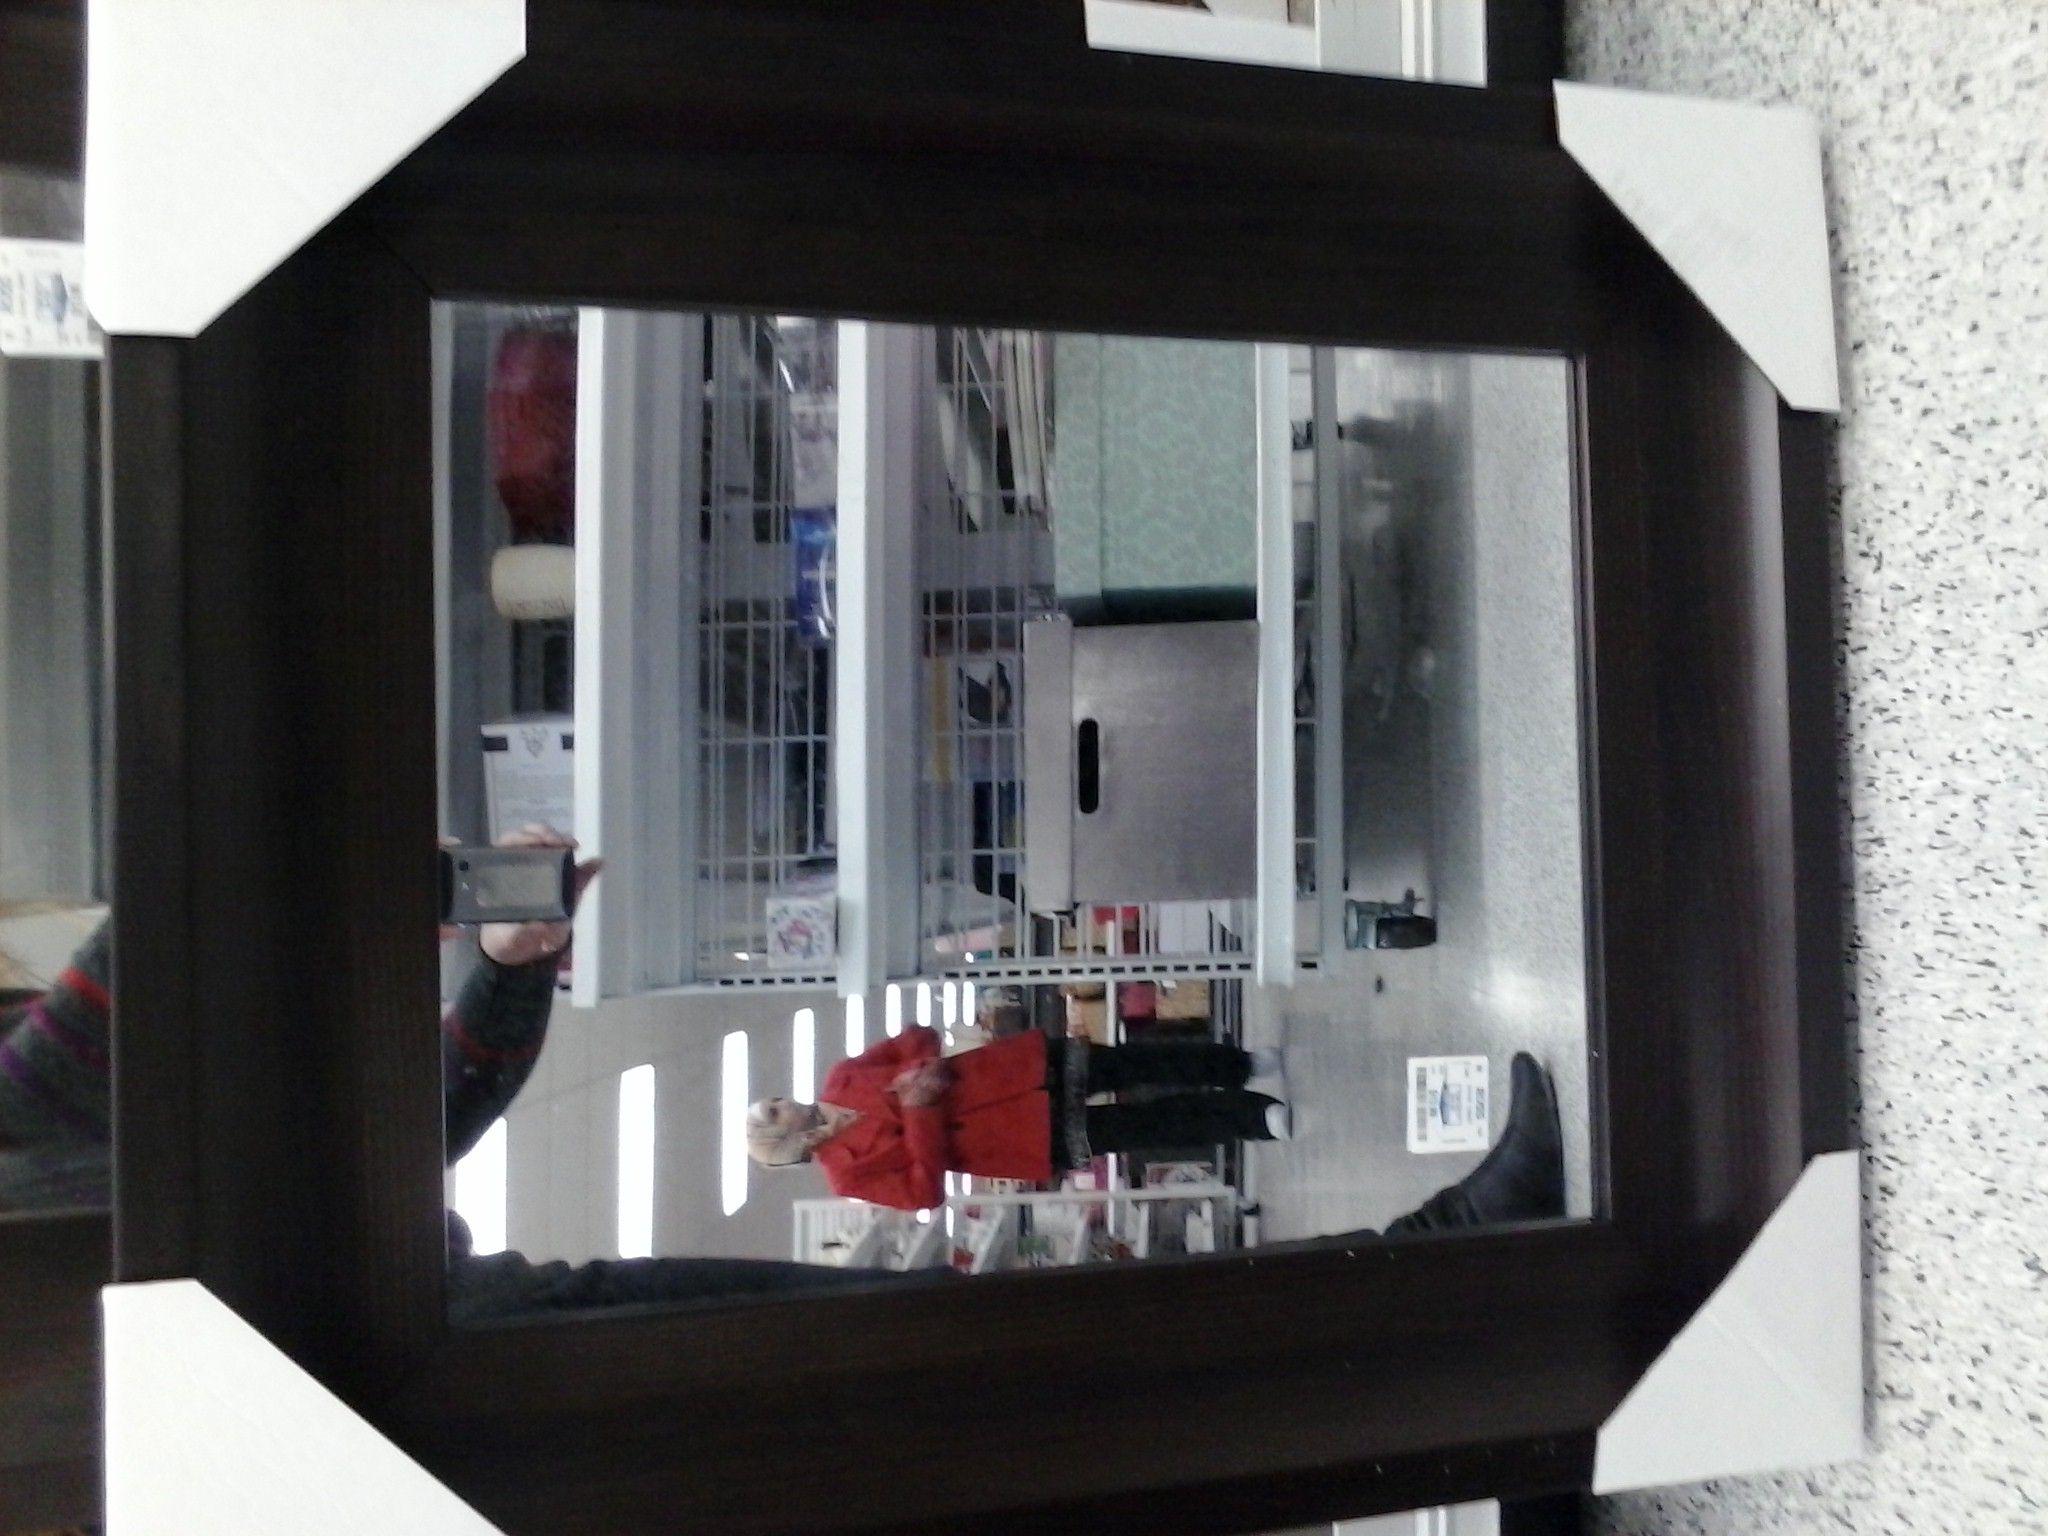 Mirror $13.99 at Ross